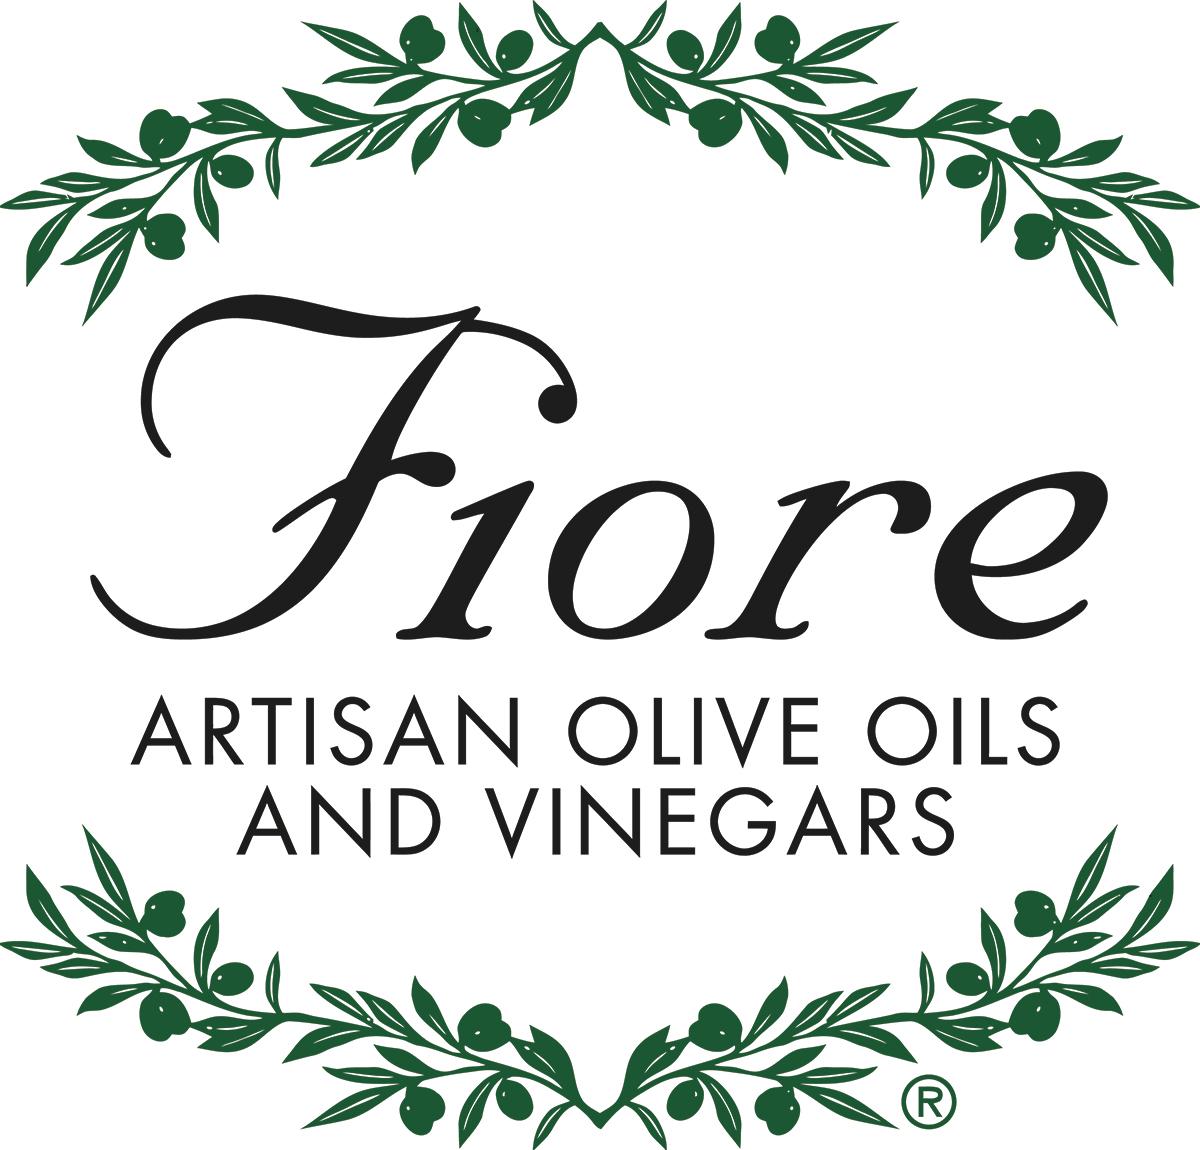 fiore-run_mdi-sponsor.jpg